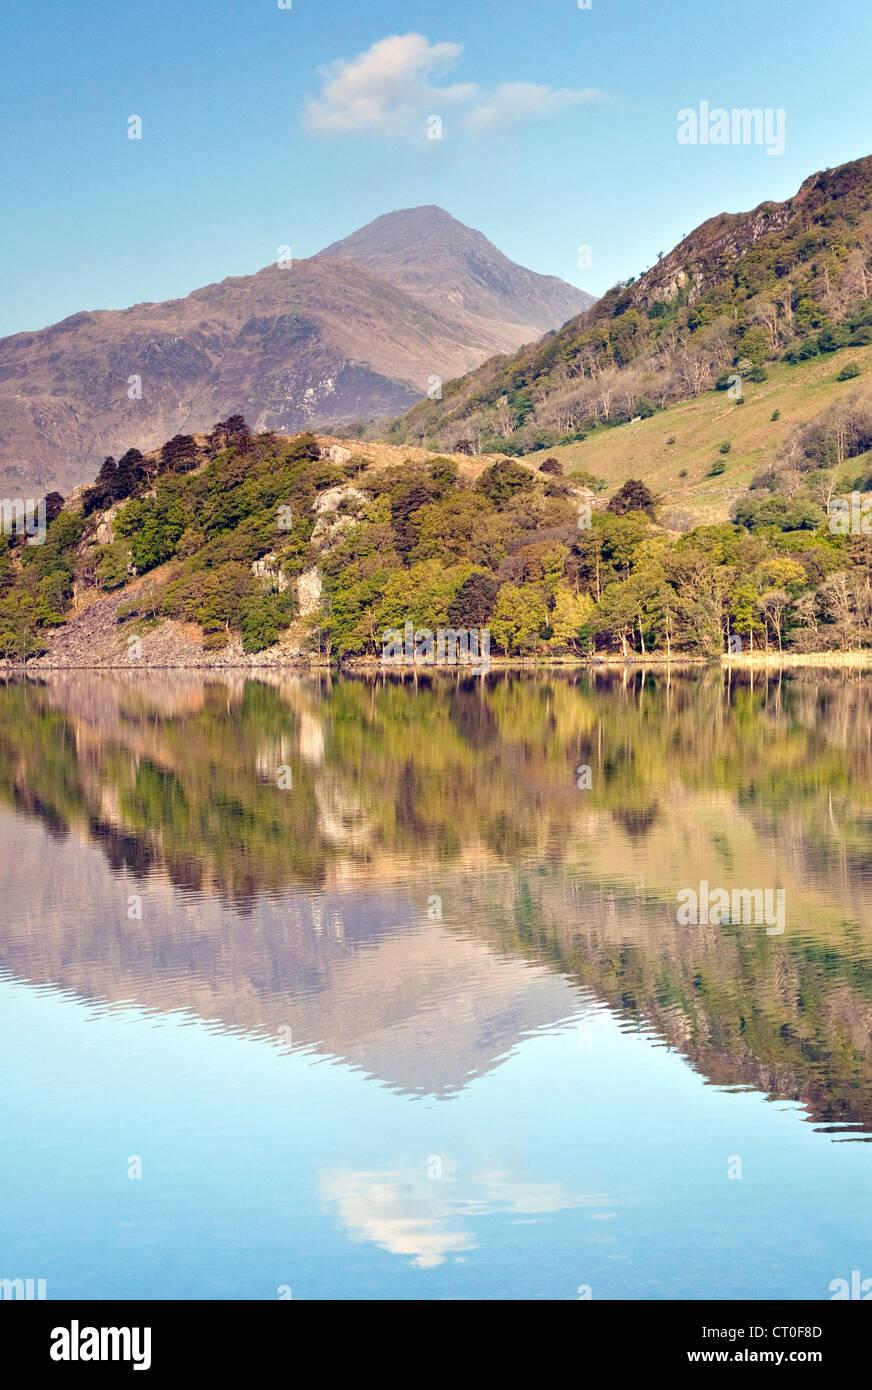 Reflections of Moel Hebog mirrored in Llyn Gwynant Lake in the Nantgwynant Valley Snowdonia National Park Gwynedd North Wales UK Stock Photo